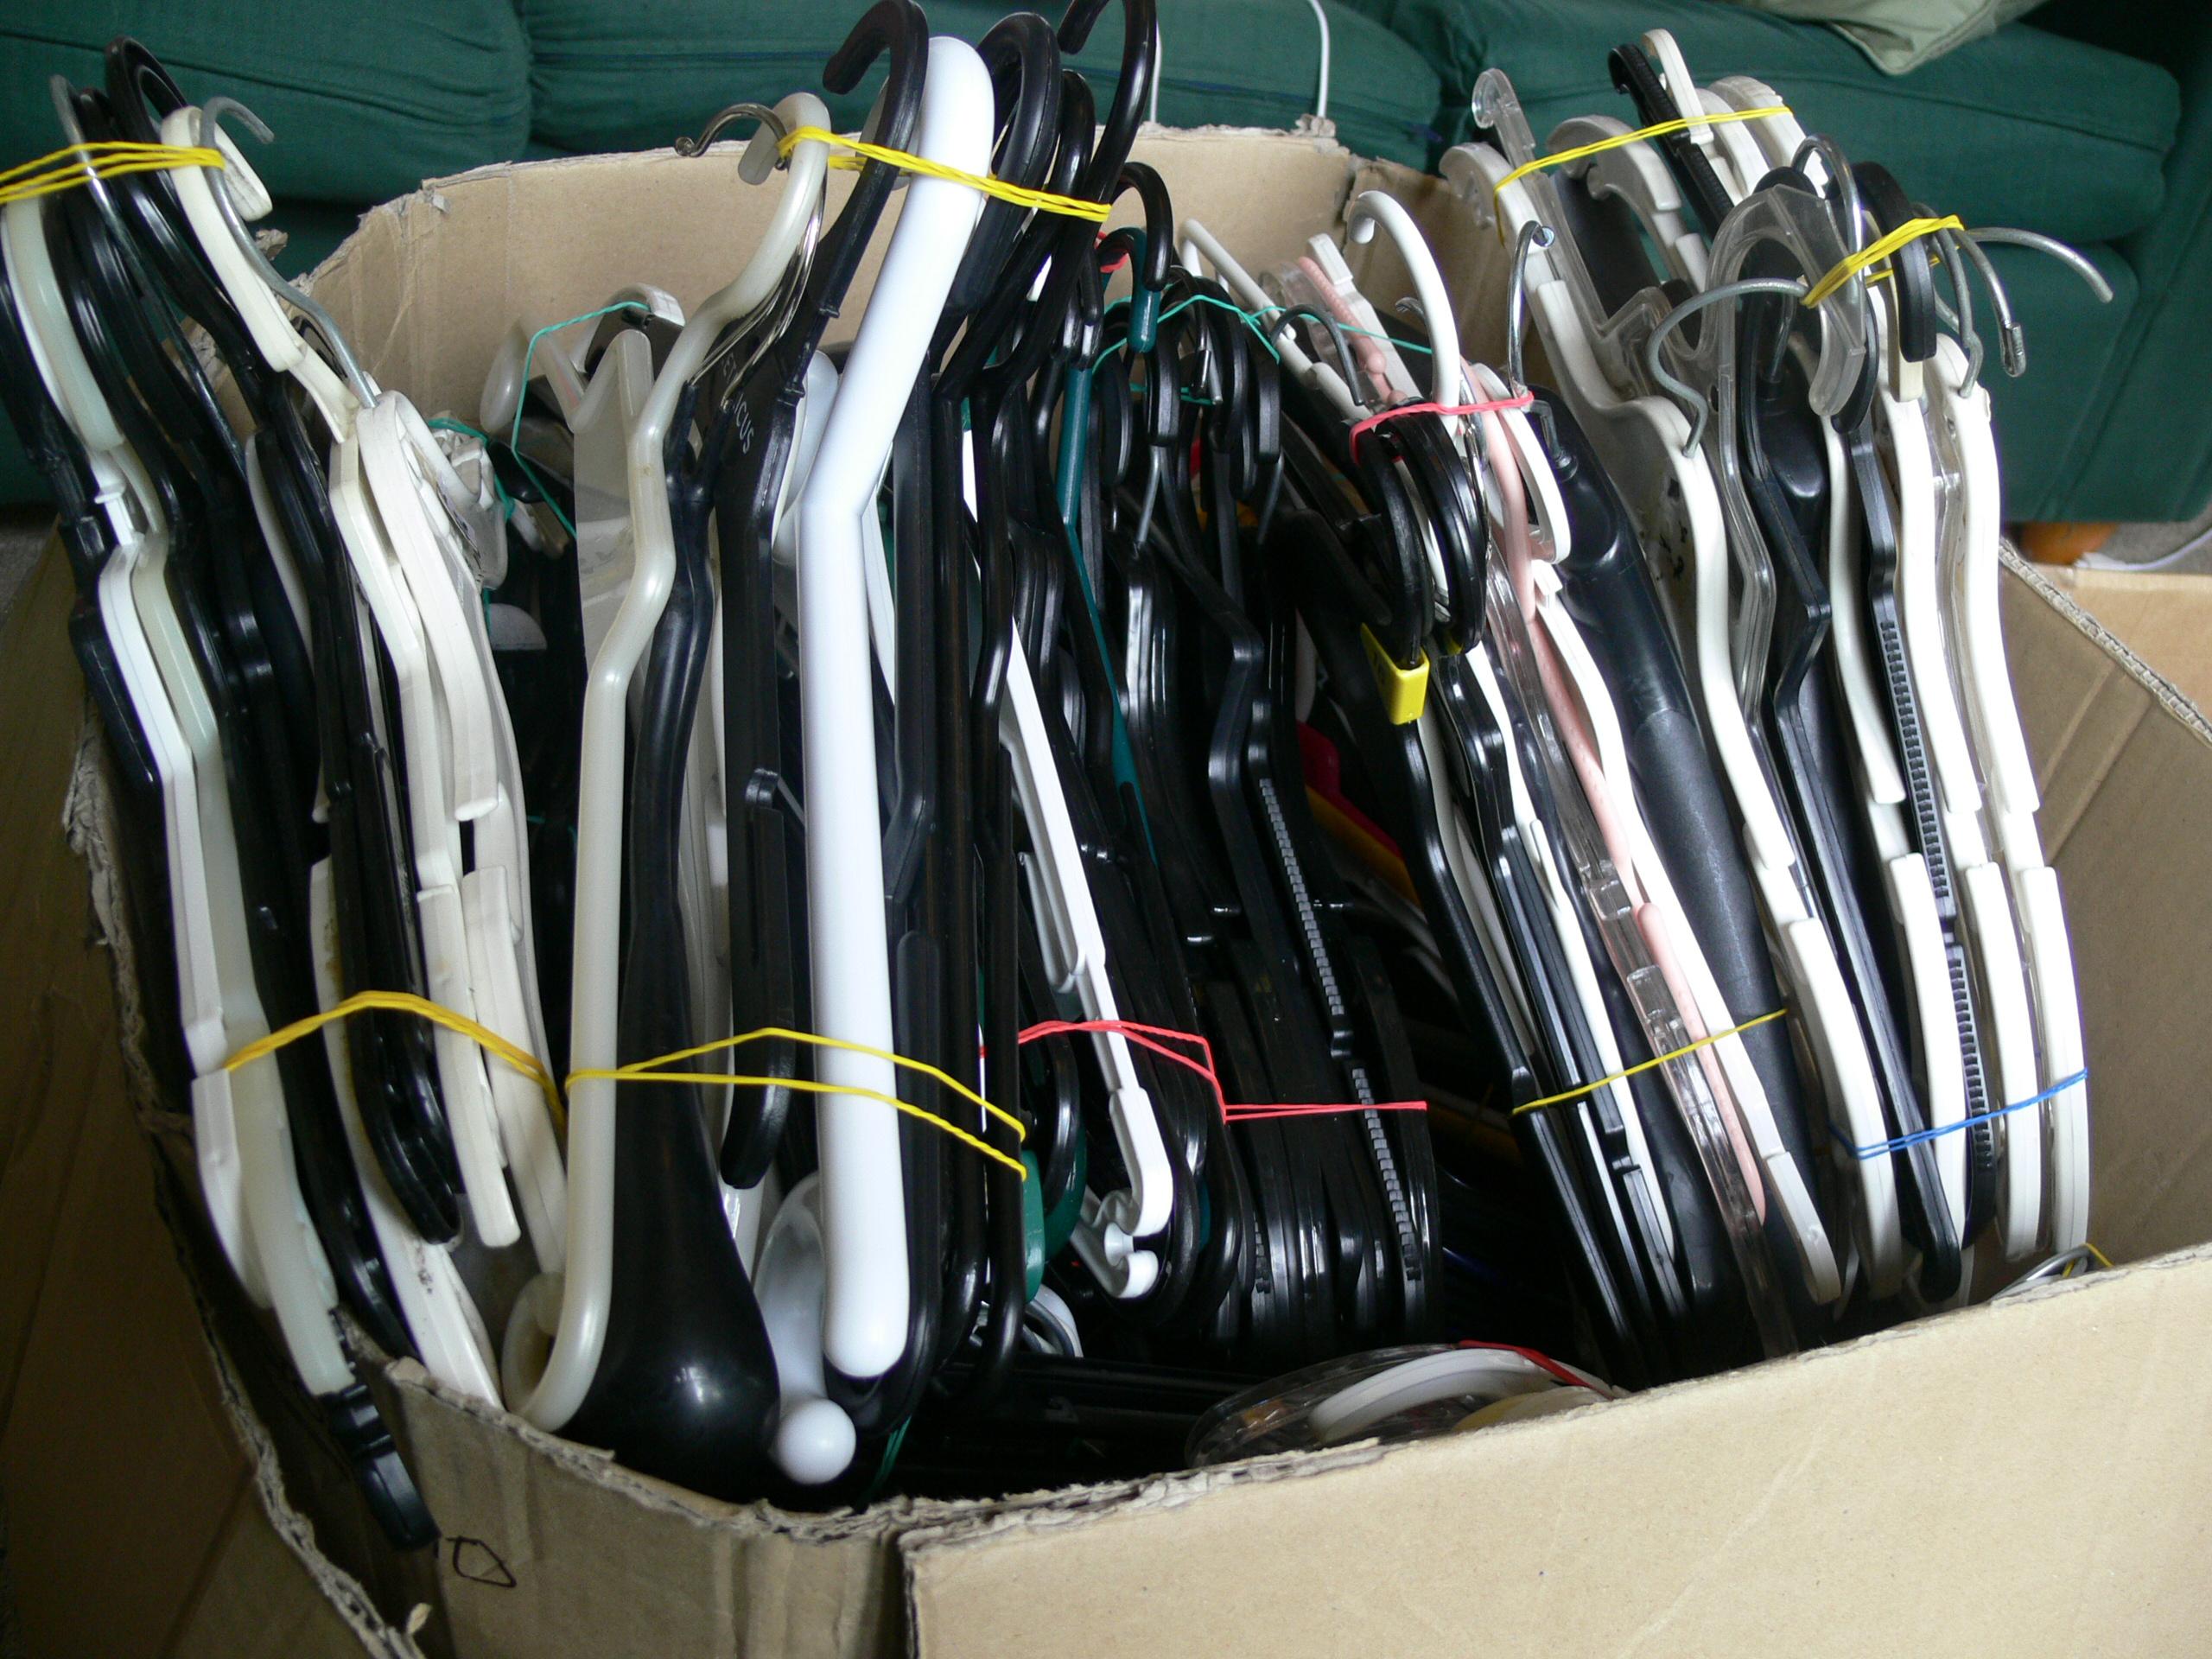 hangers in box